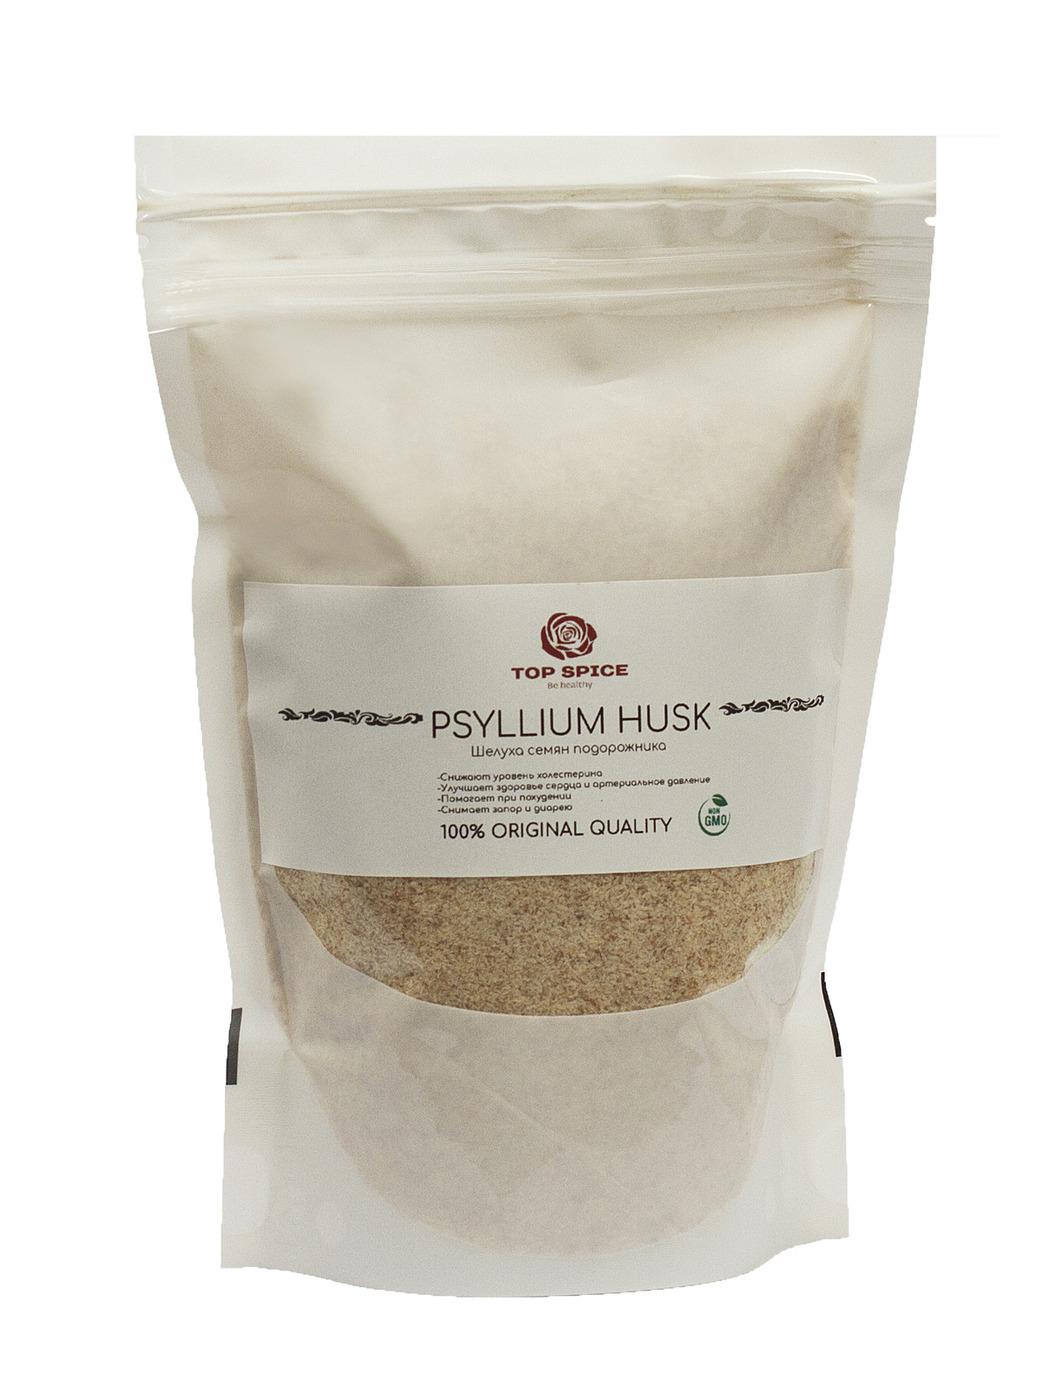 Псиллиум, bio organiс. Шелуха 200 гр. Мощная клетчатка